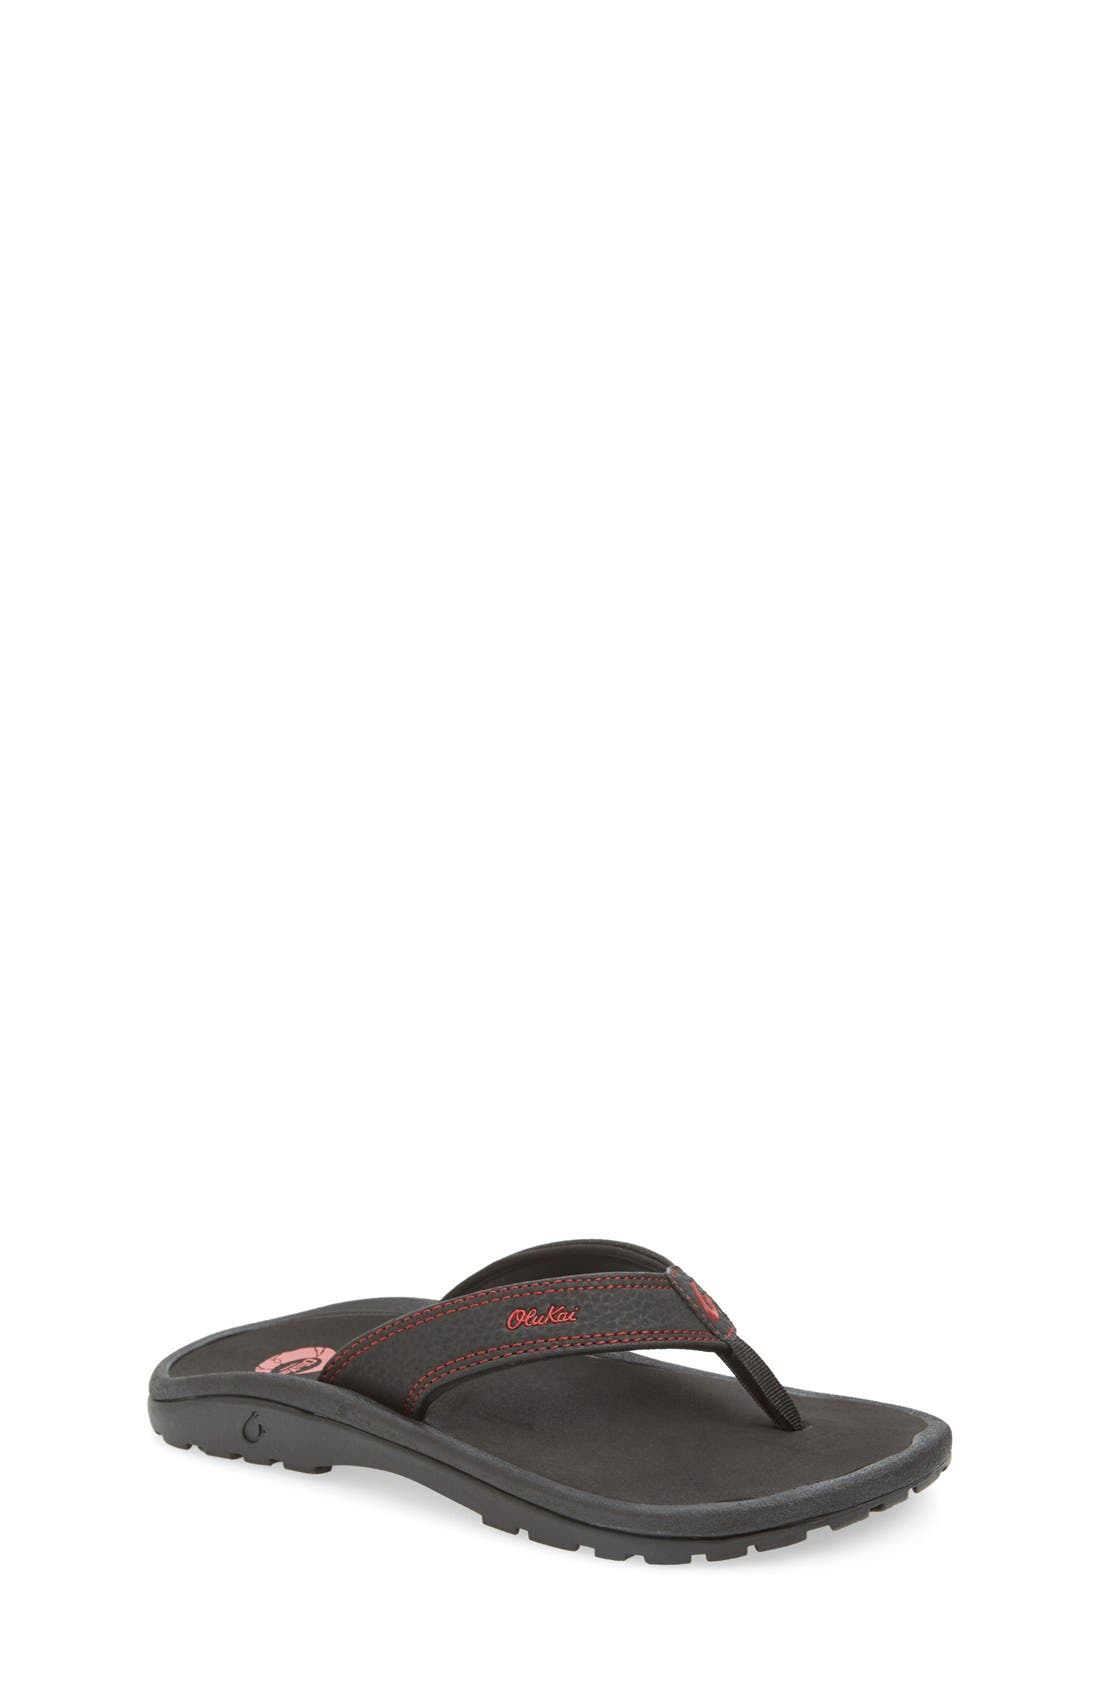 ad6c71b33579 OluKai Sandals for Kids